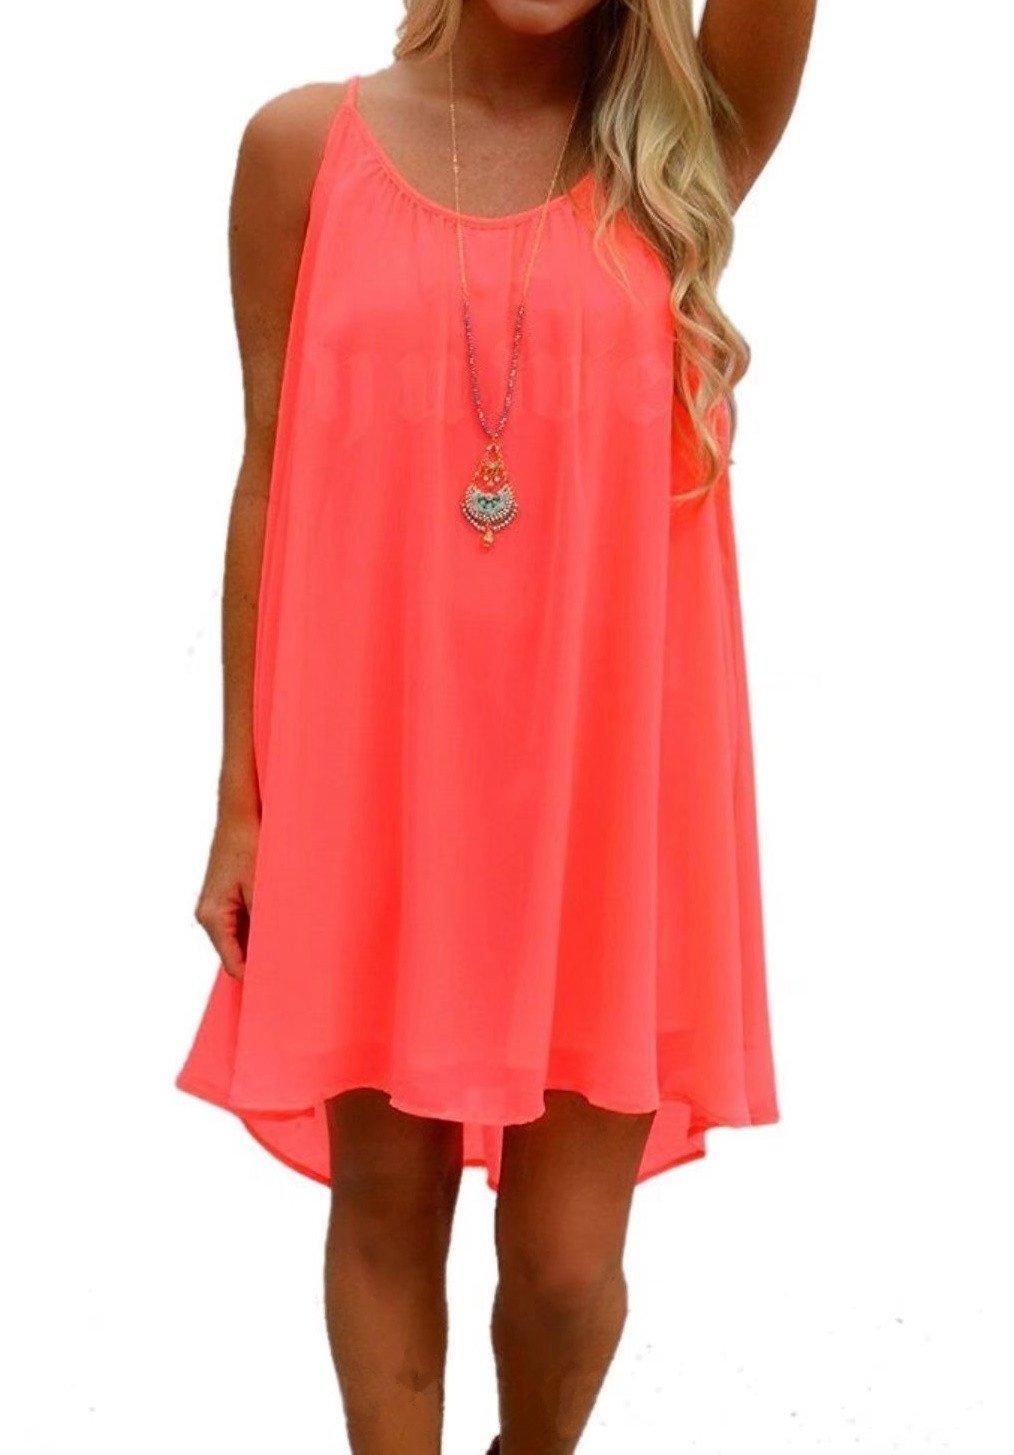 LeaLac Women's Summer Cotton Petite Fashion Vest Beach Bikini Swimsuit Swimwear Crochet Dress Gift for Women Q24843 Fluorescence Red